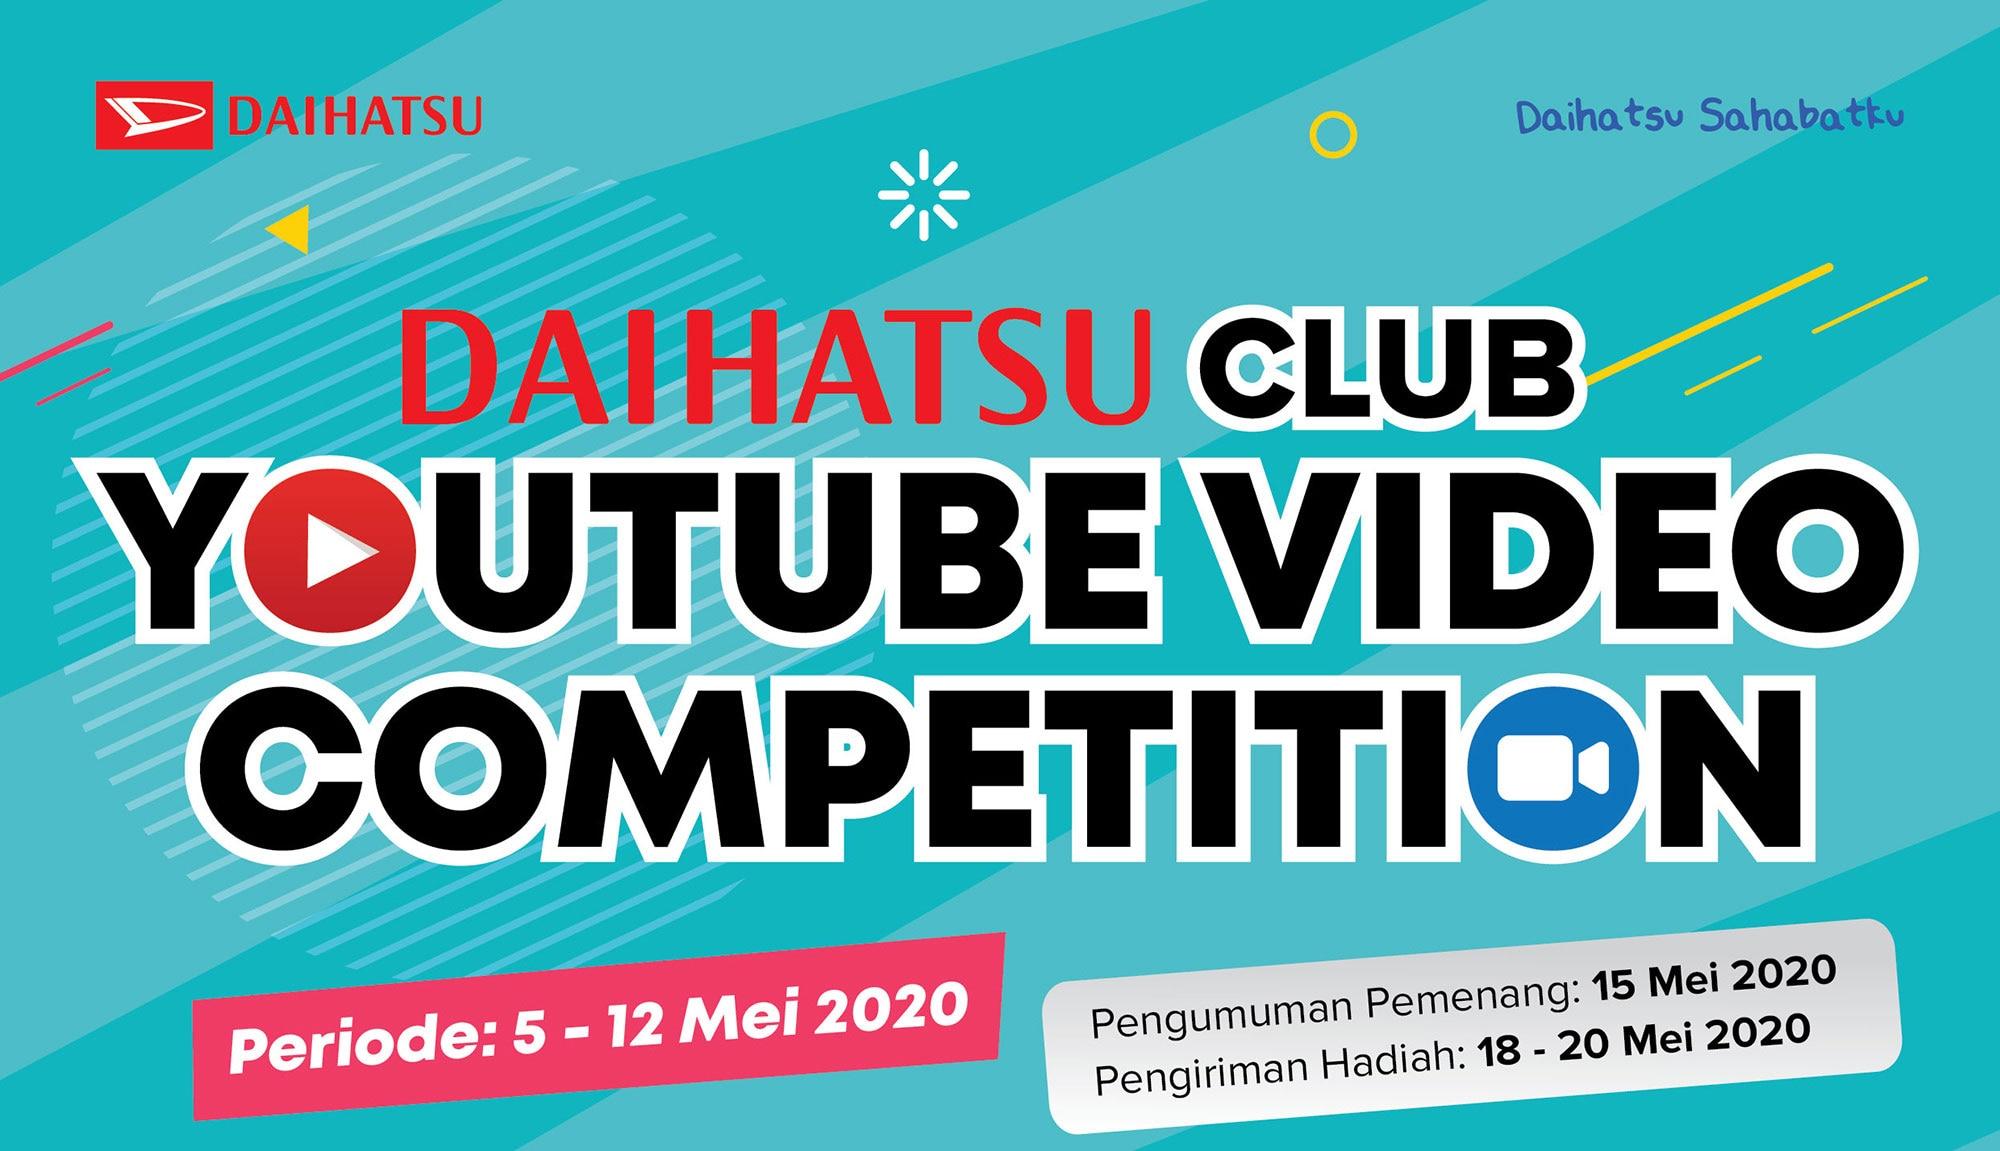 Manfaatkan WFH, Daihatsu Gelar Kompetisi Digital Antar Komunitas